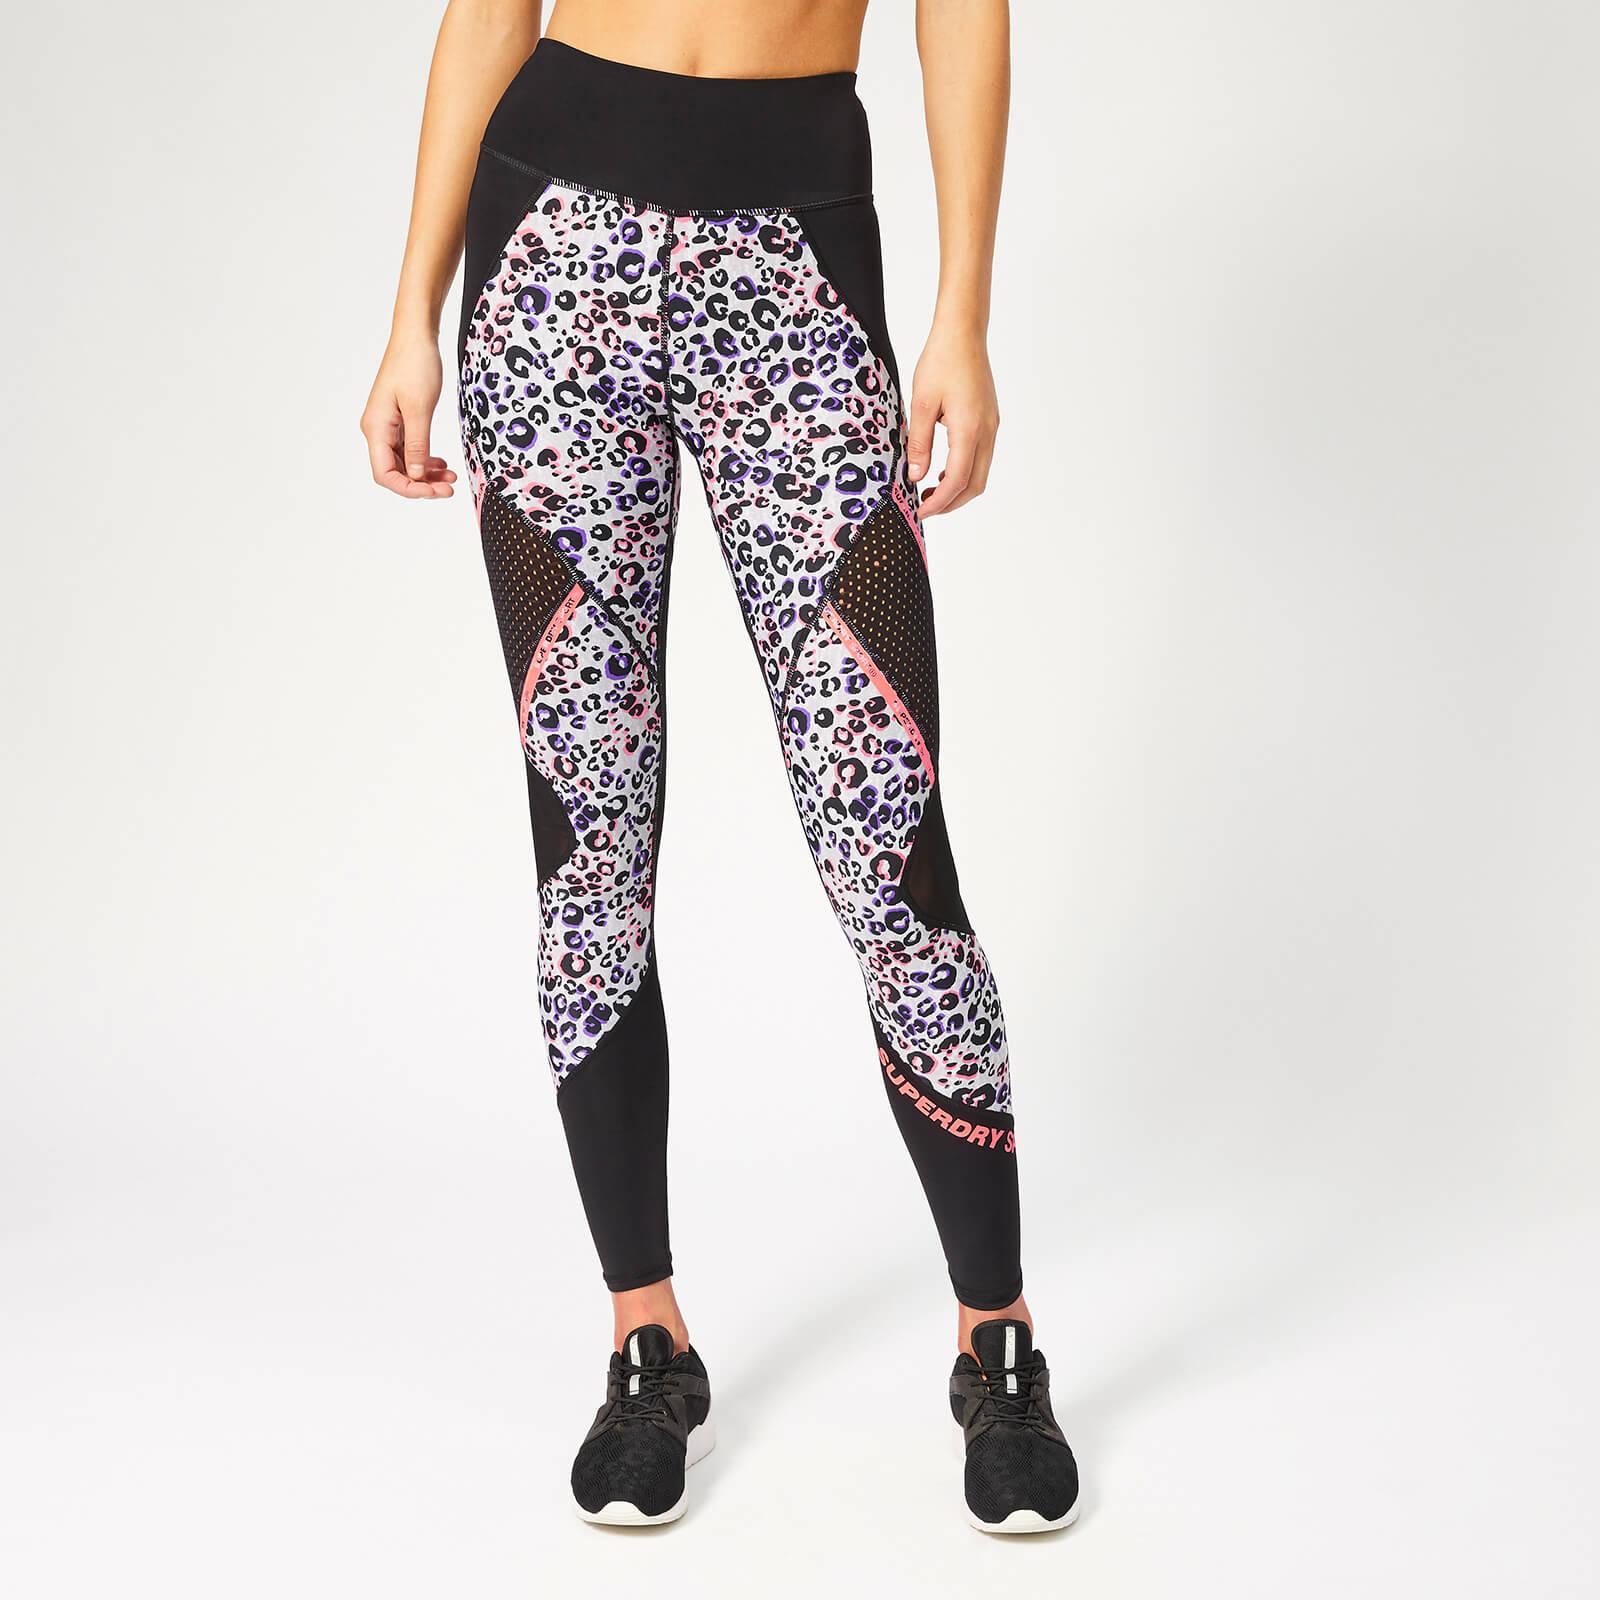 b1d6ed266ec7c Superdry Sport Women's Active Mesh Panel Leggings - Lola Leopard Coral Print  Womens Clothing | TheHut.com